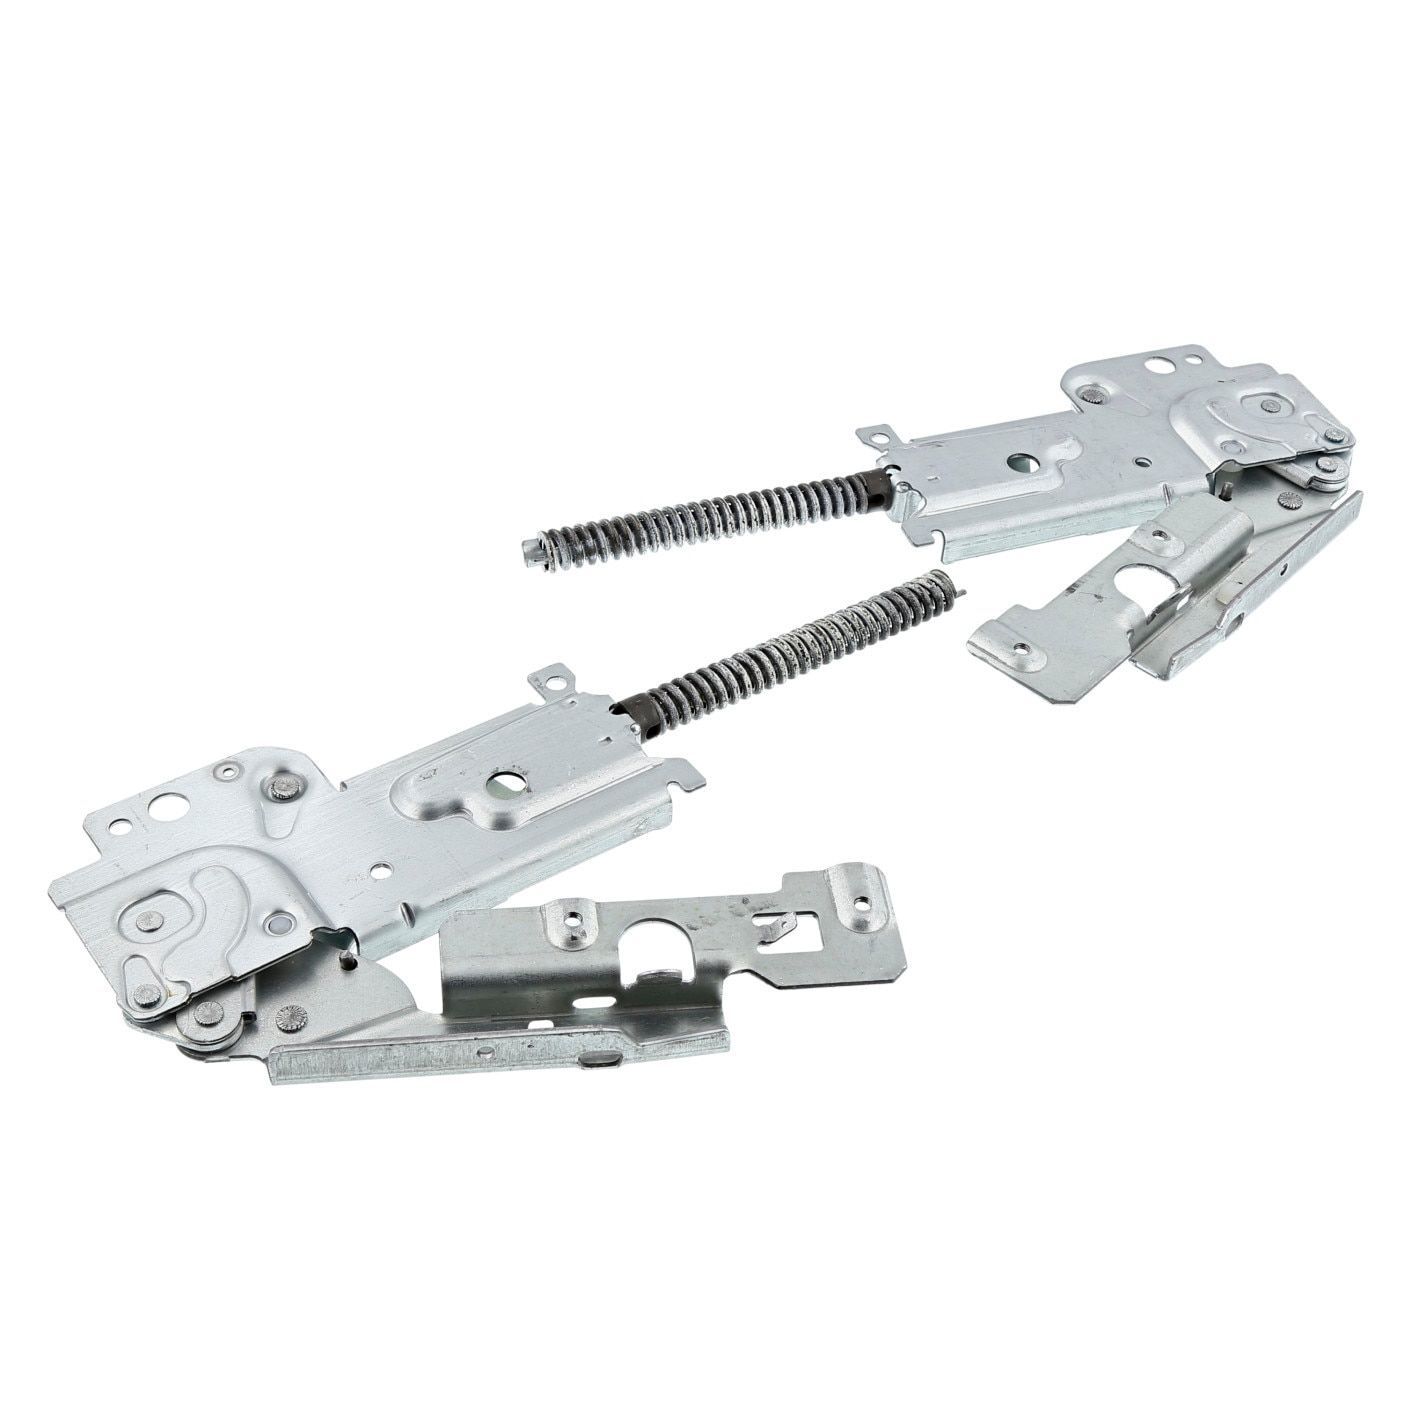 panty dveří do myčky Zanussi Electrolux AEG - sada 2 ks - 4055053450 AEG / Electrolux / Zanussi